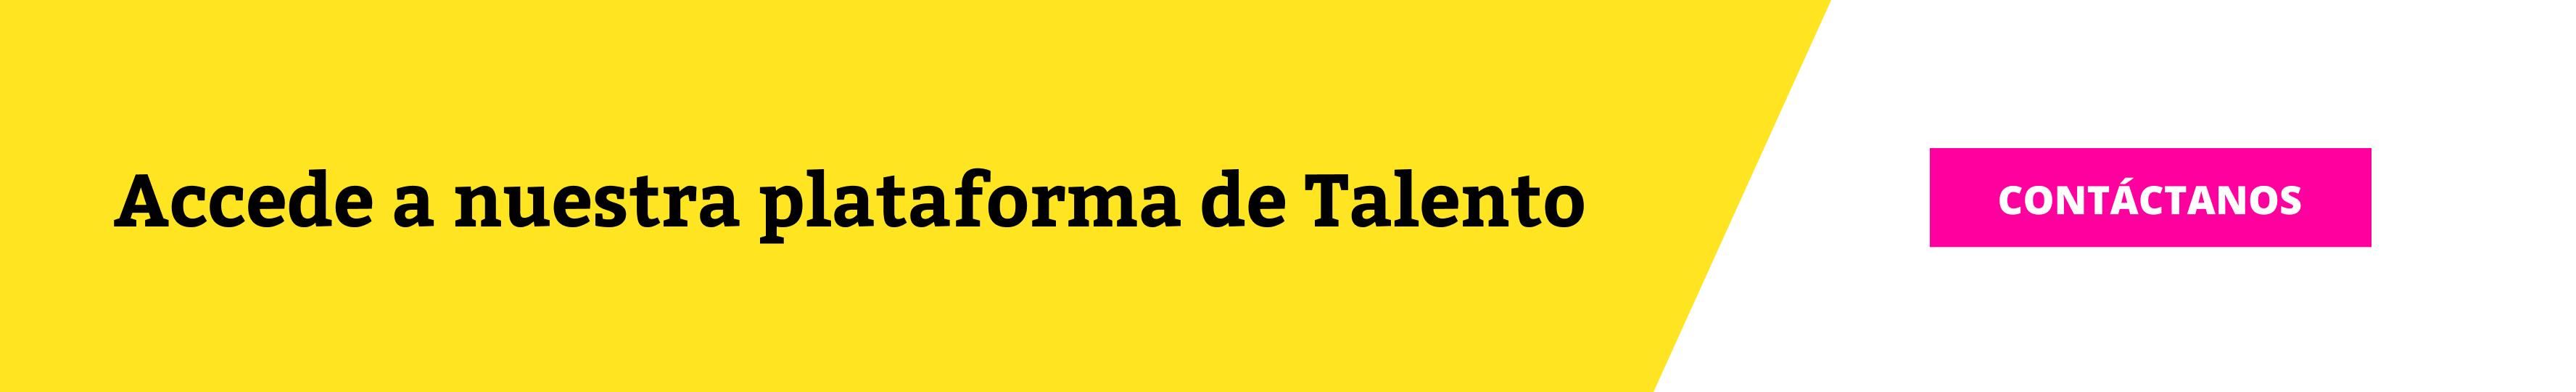 Banner-app-talento